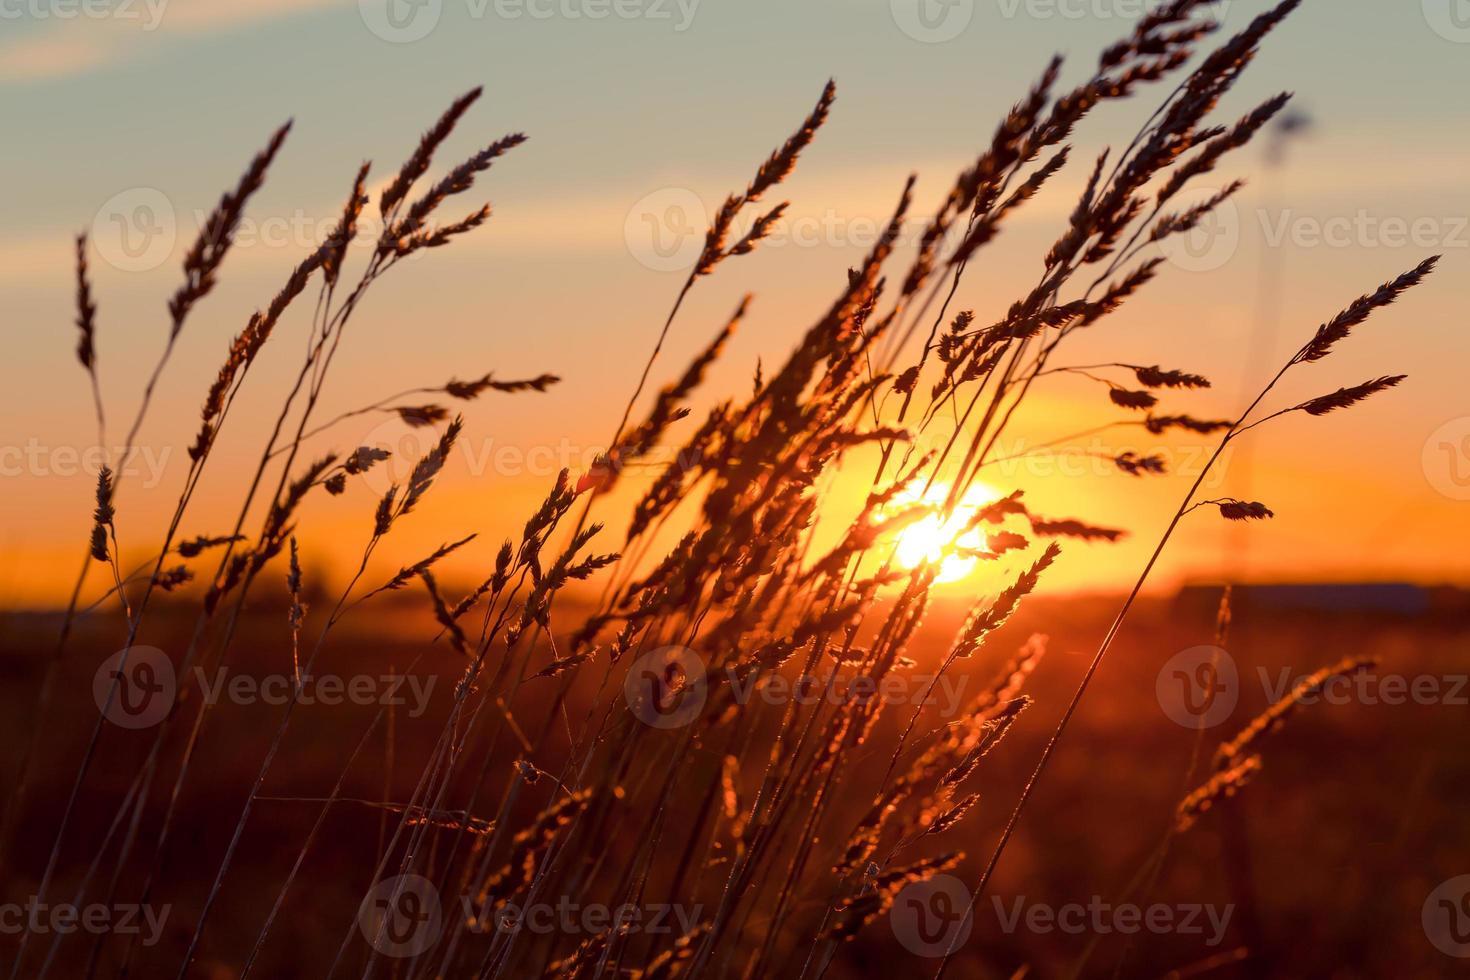 Grass at sunset photo